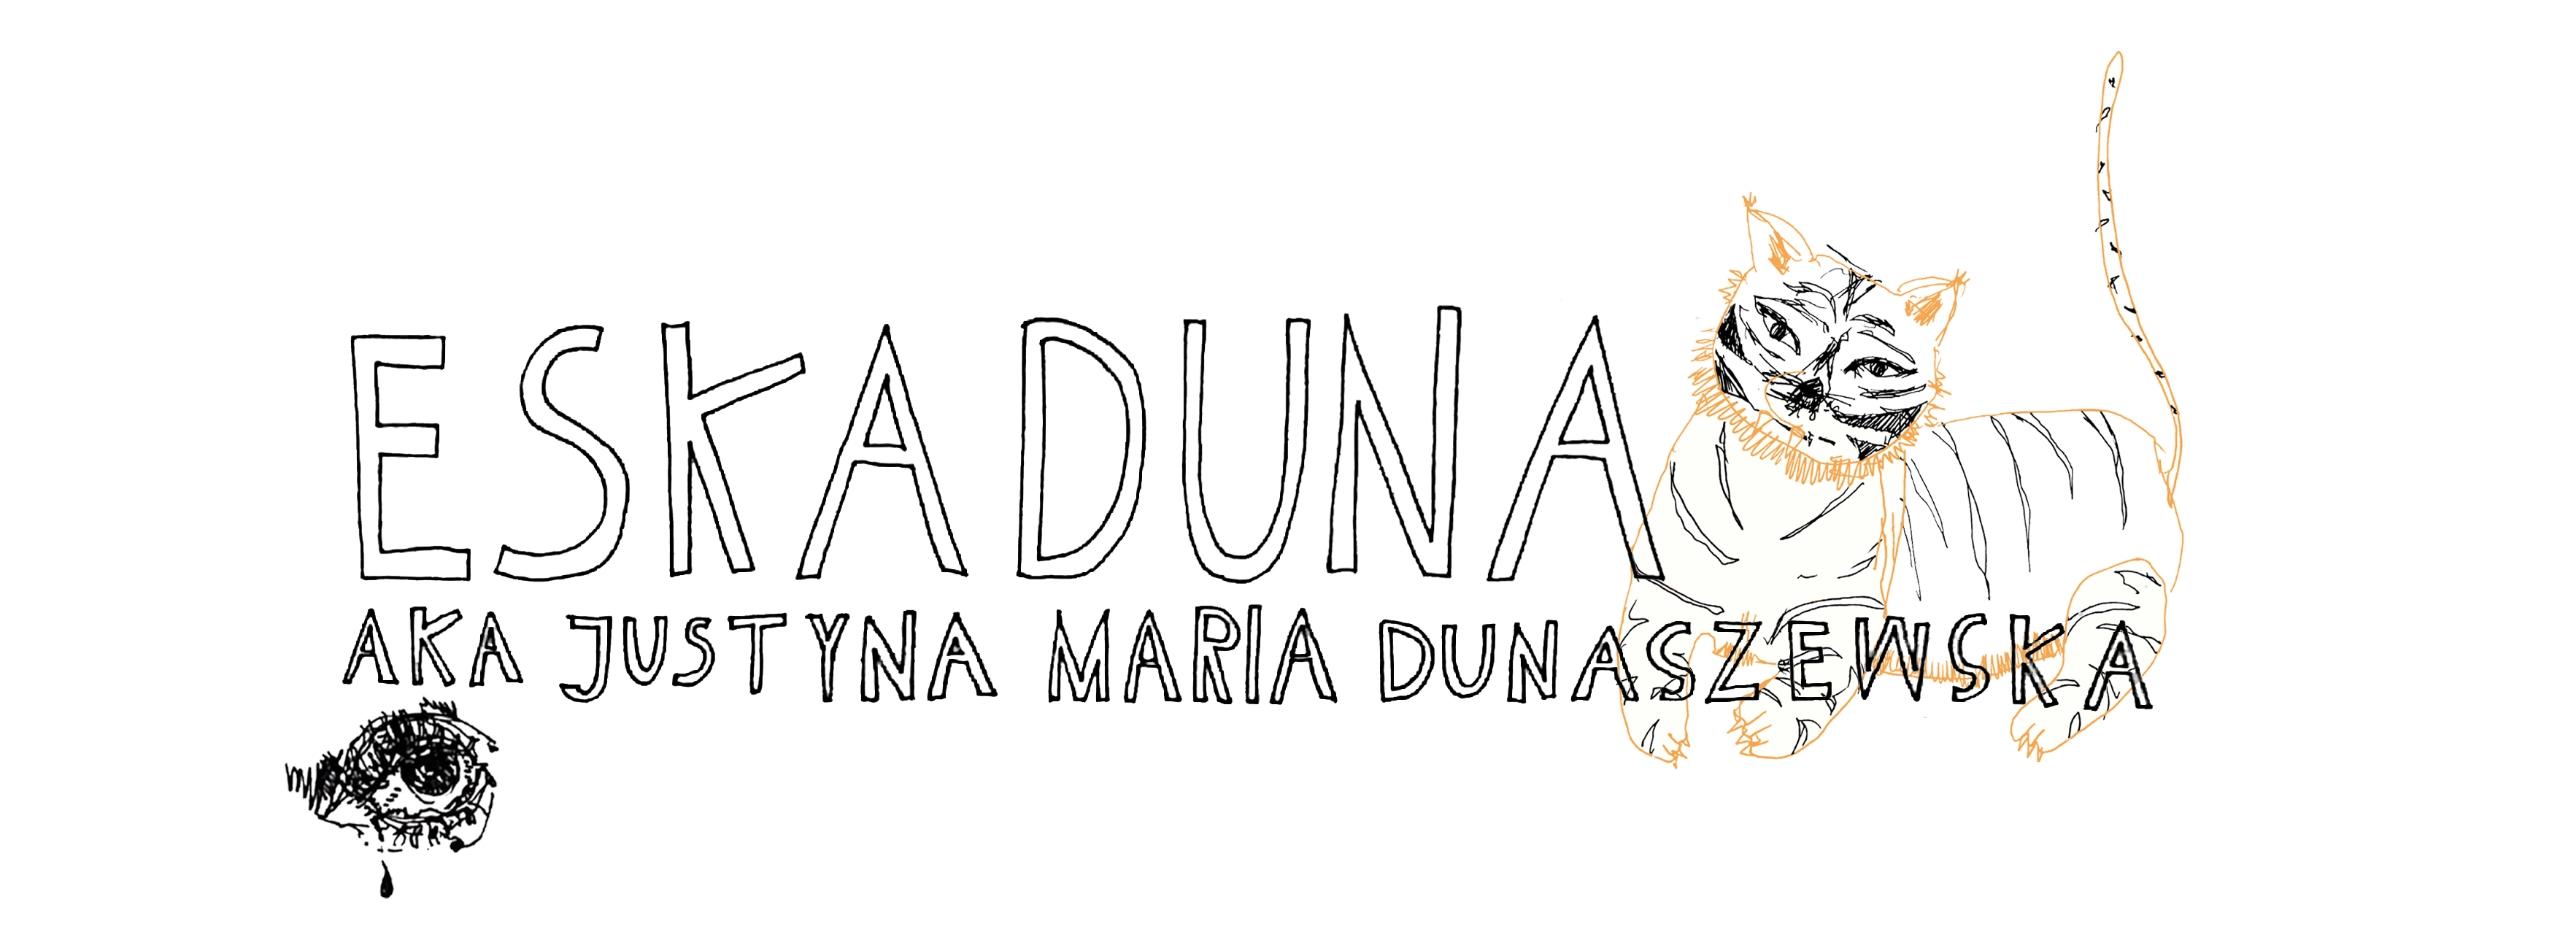 Justyna M (@eskaduna) Cover Image